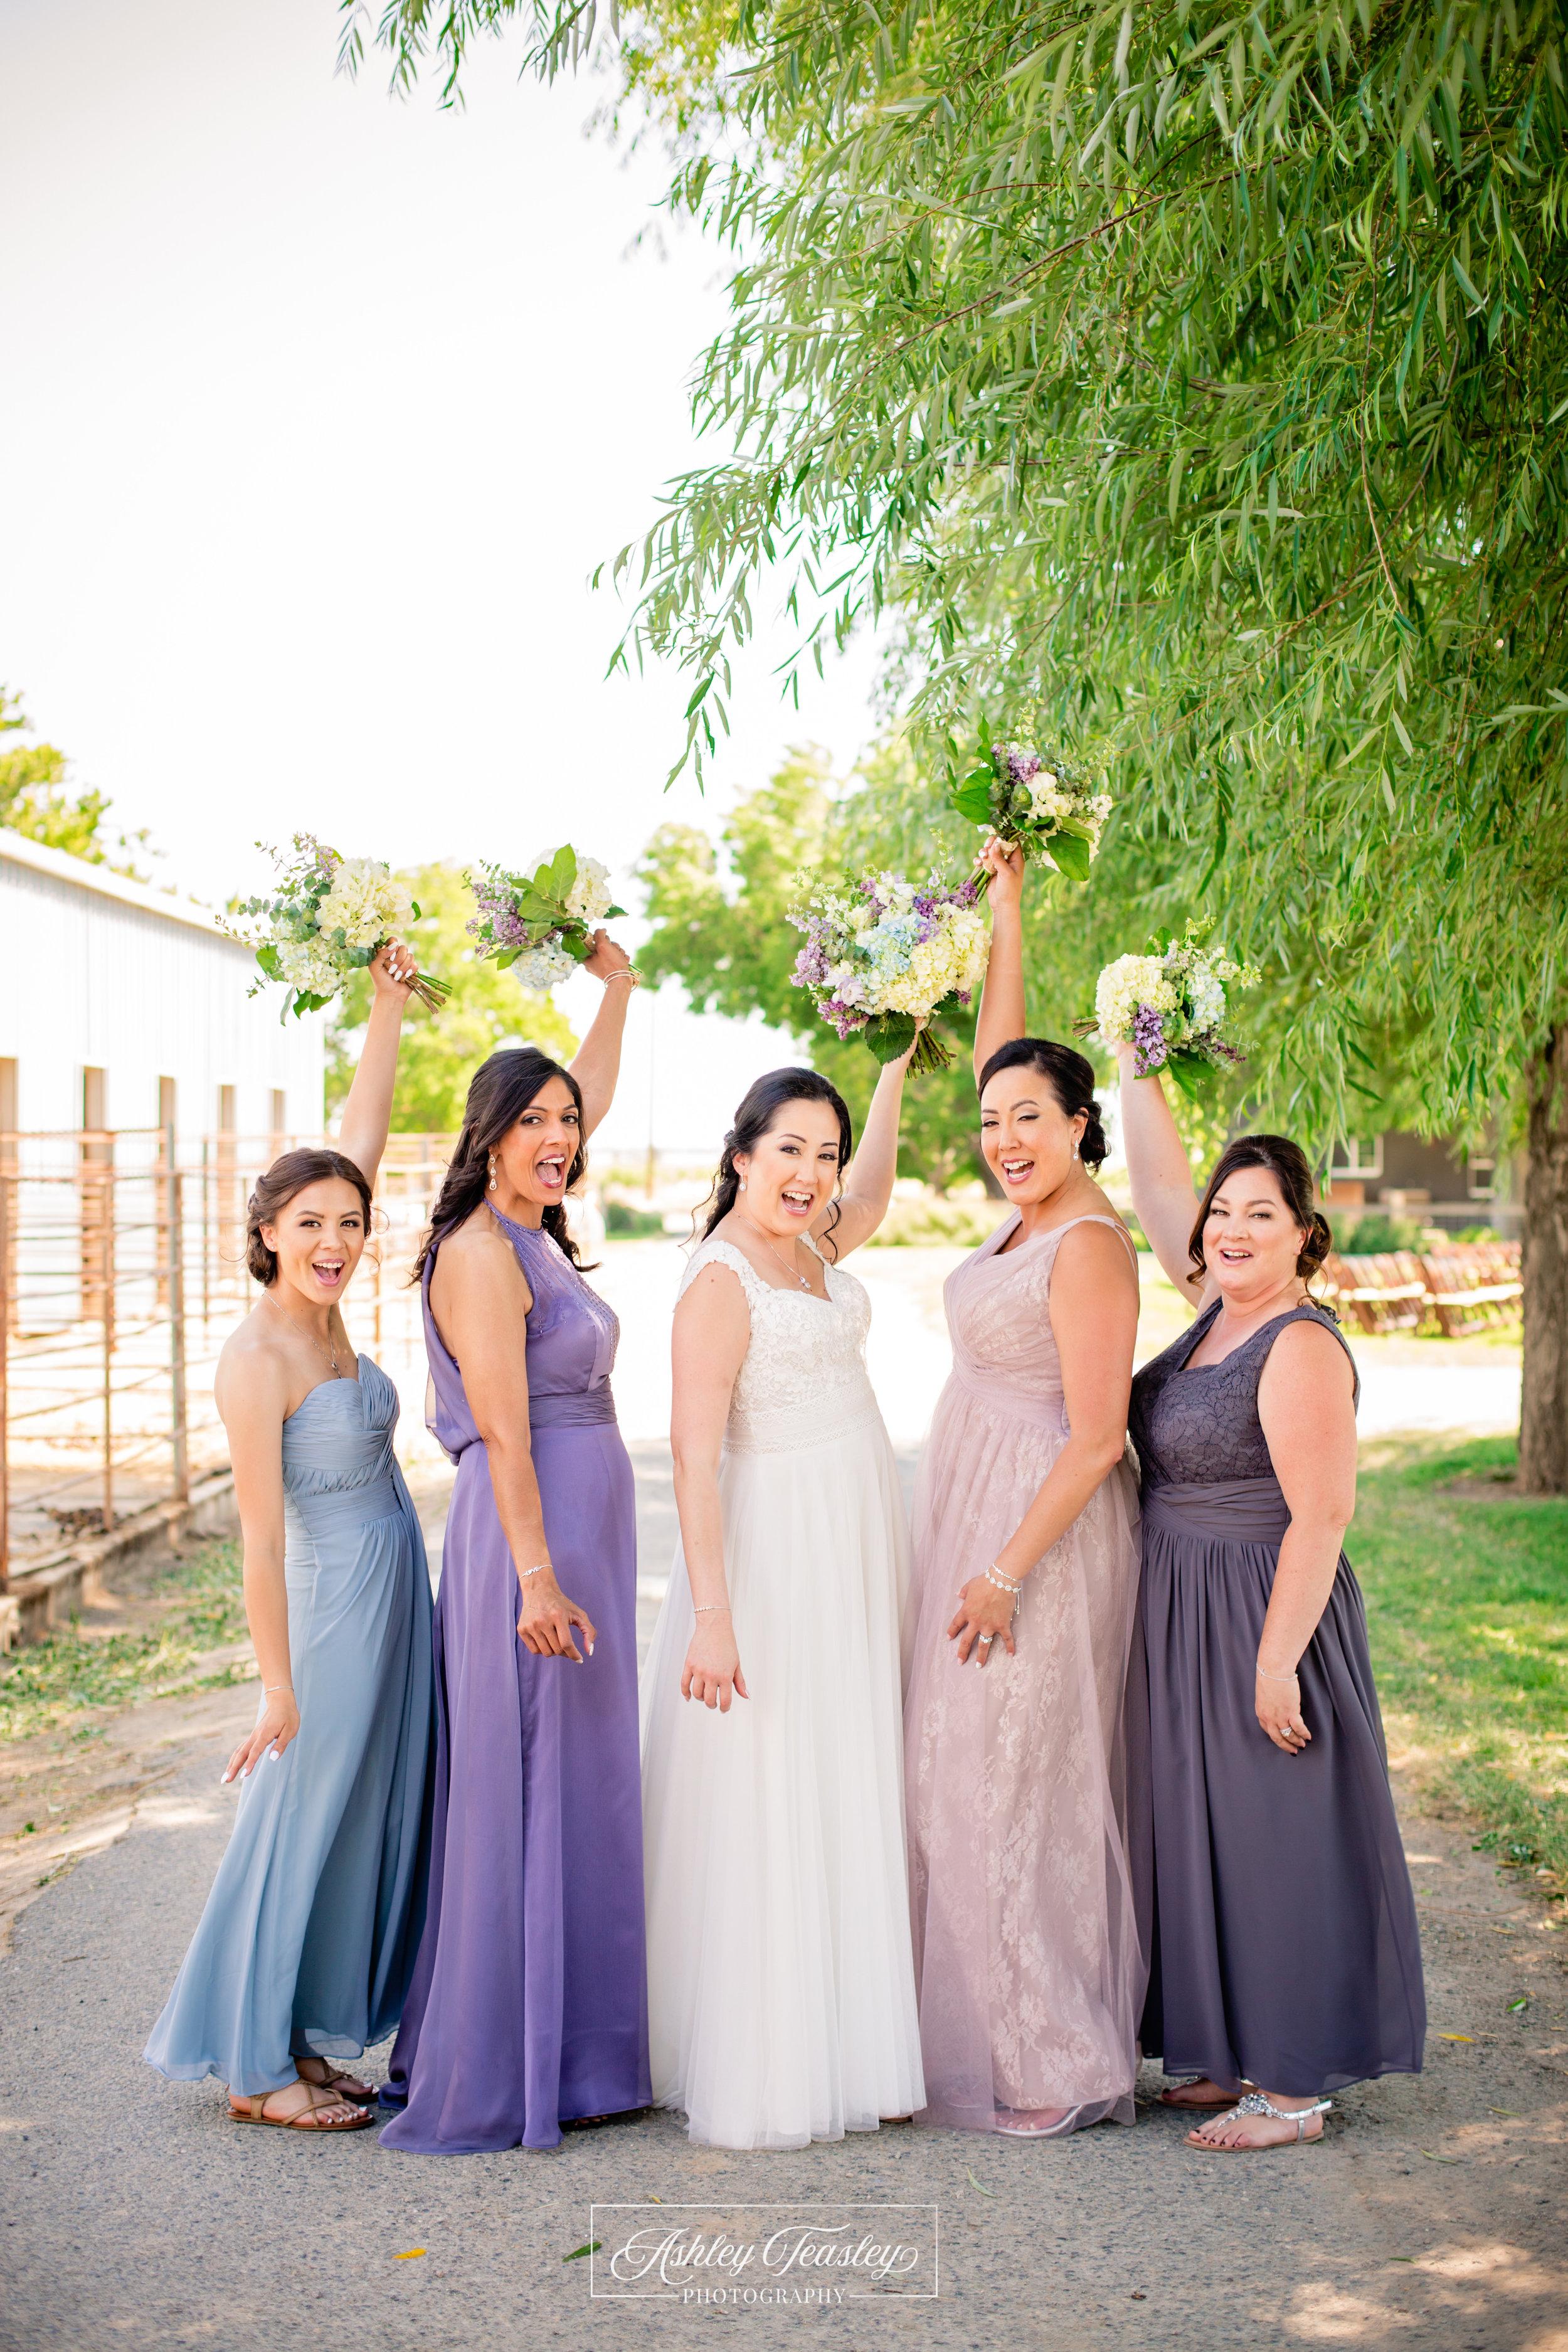 Jeanette & Rance - Butte Star Ranch - Sacramento Wedding Photographer - Ashley Teasley Photography (30 of 41).jpg